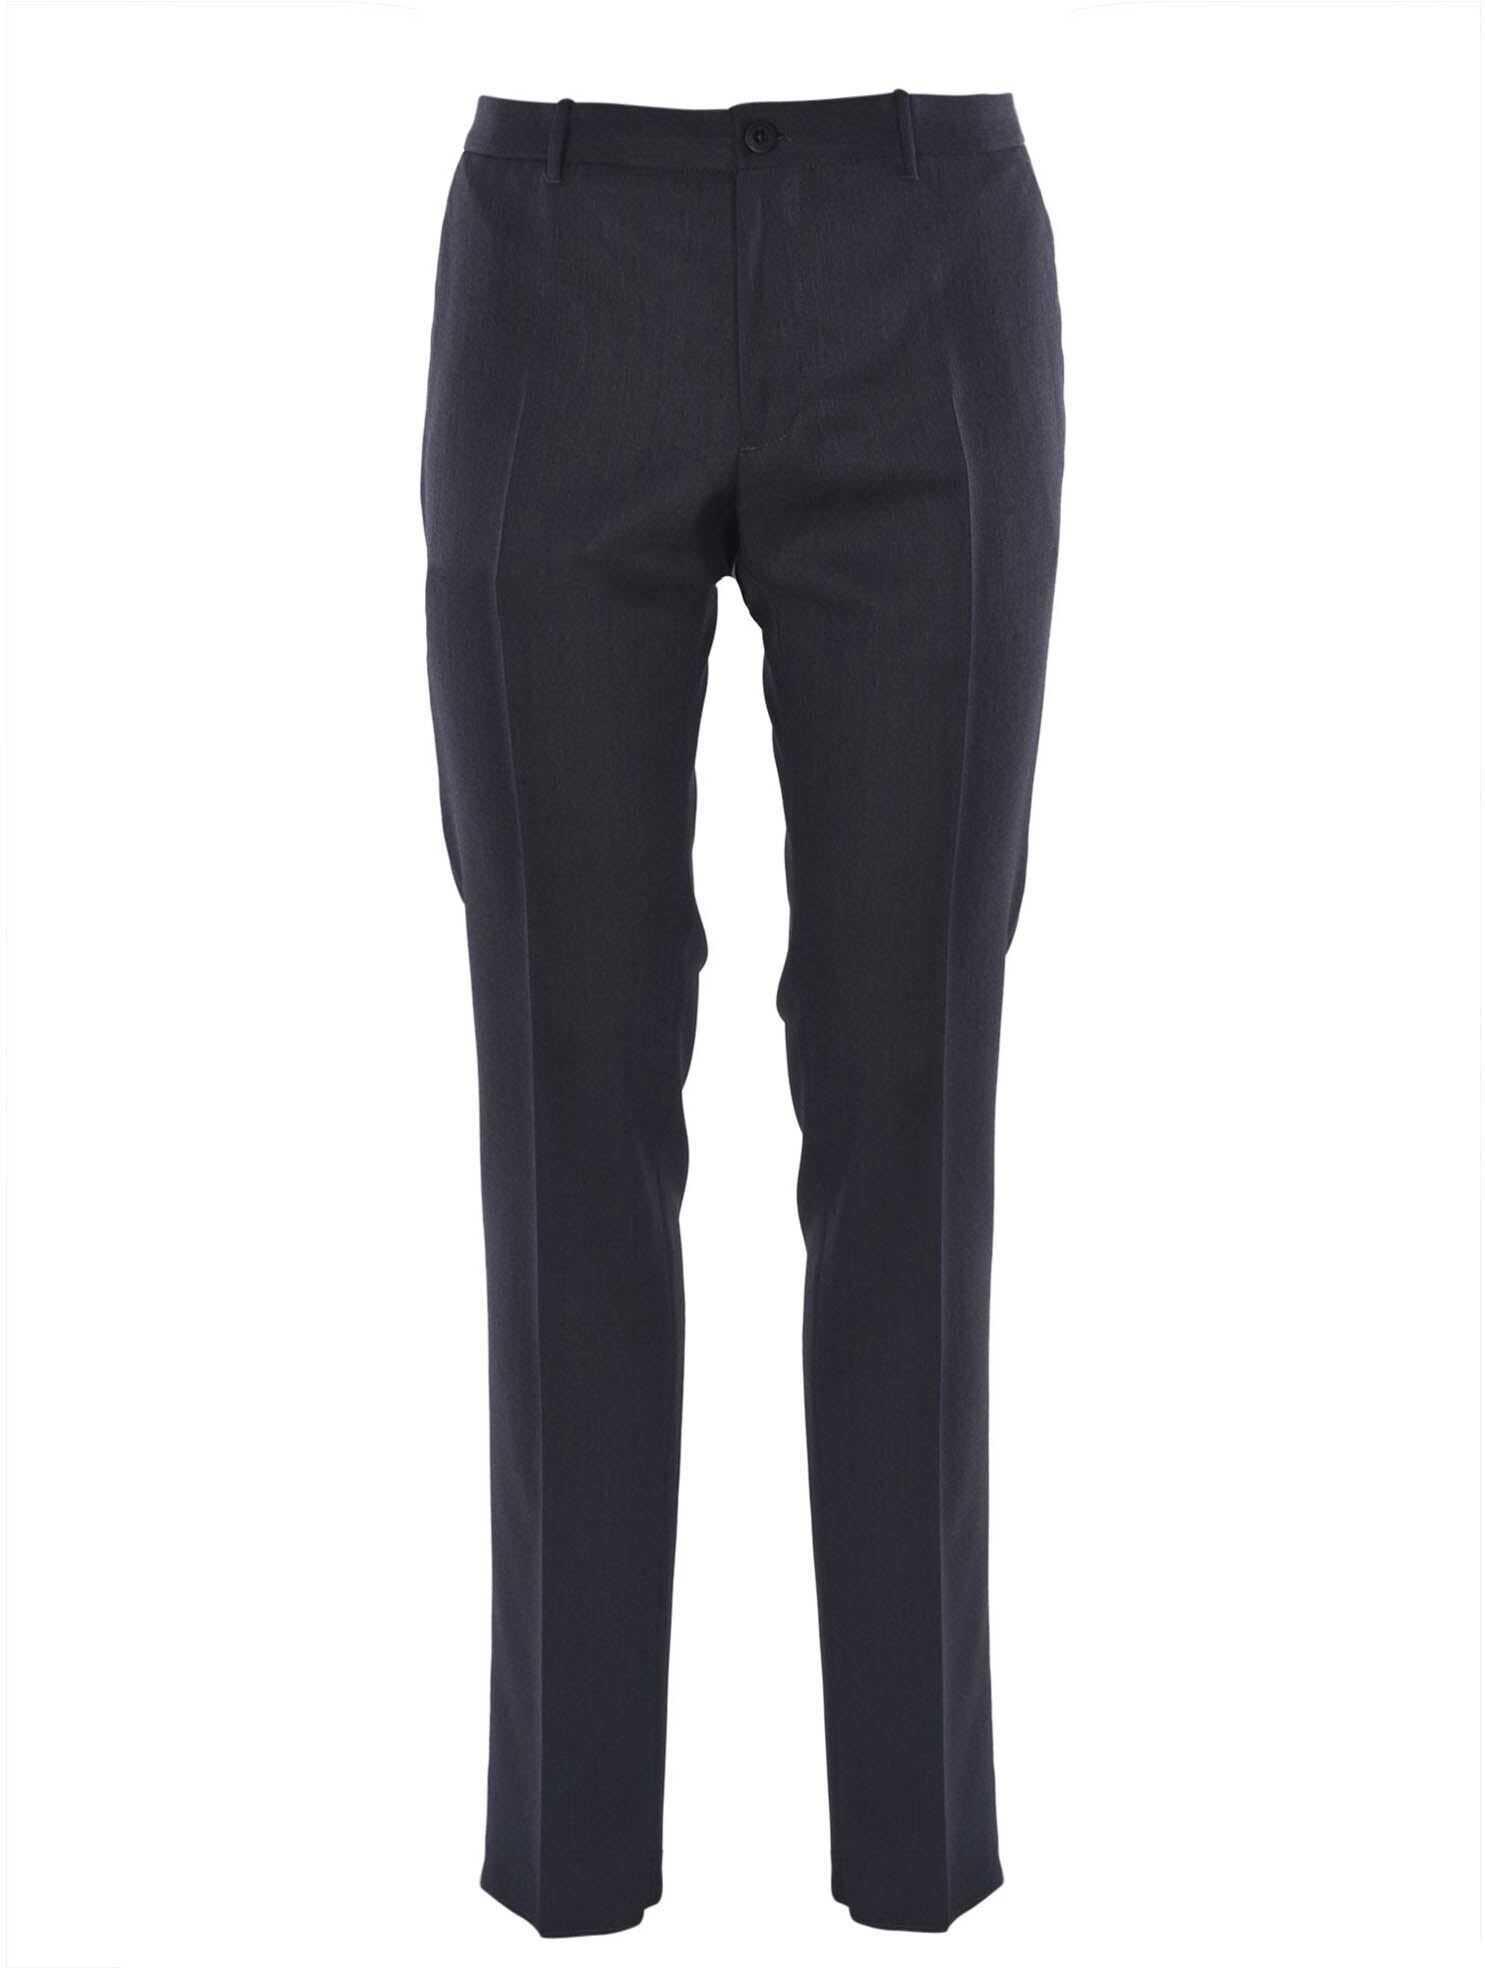 Incotex Grey Pants Grey imagine